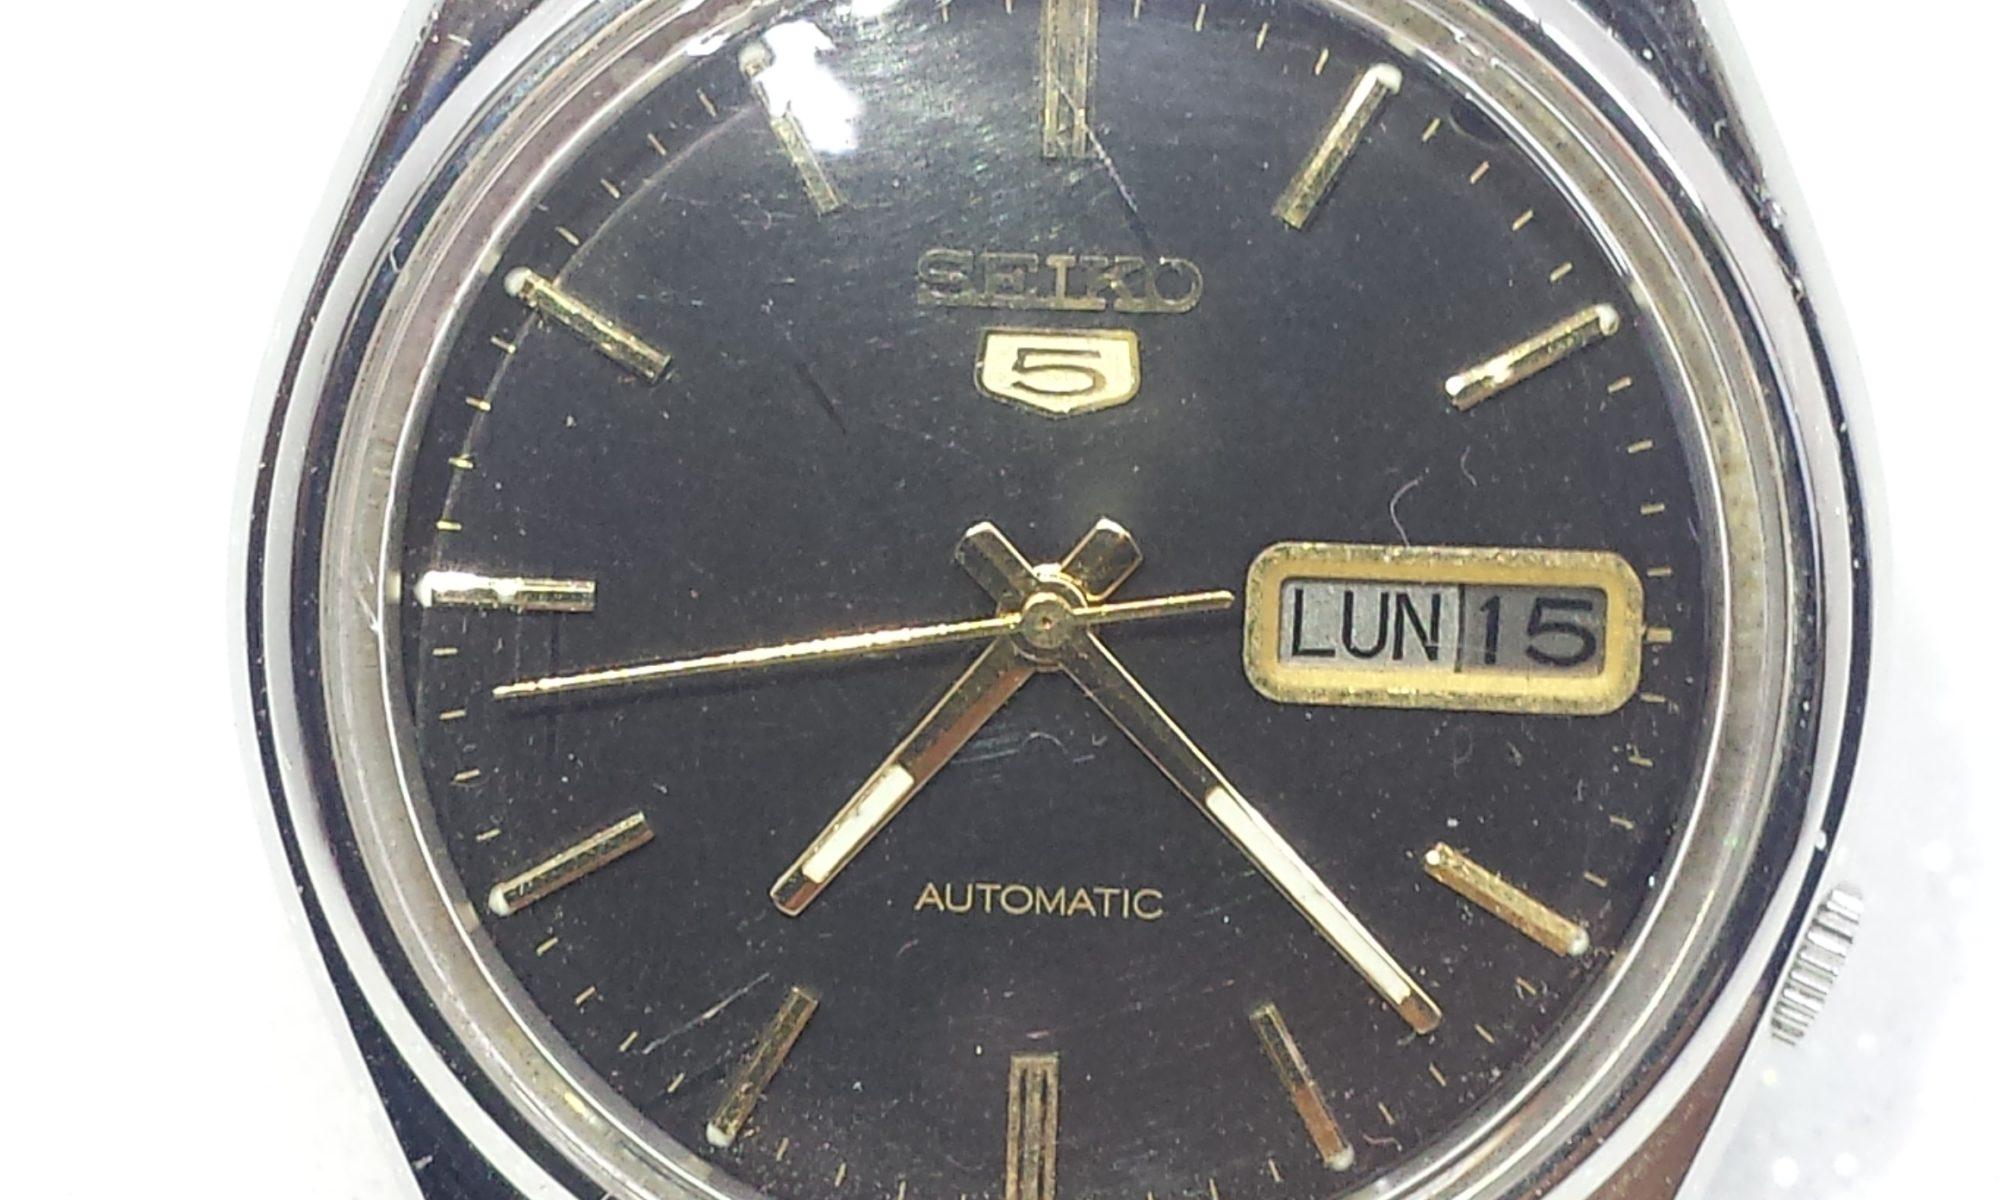 Seiko Automatico